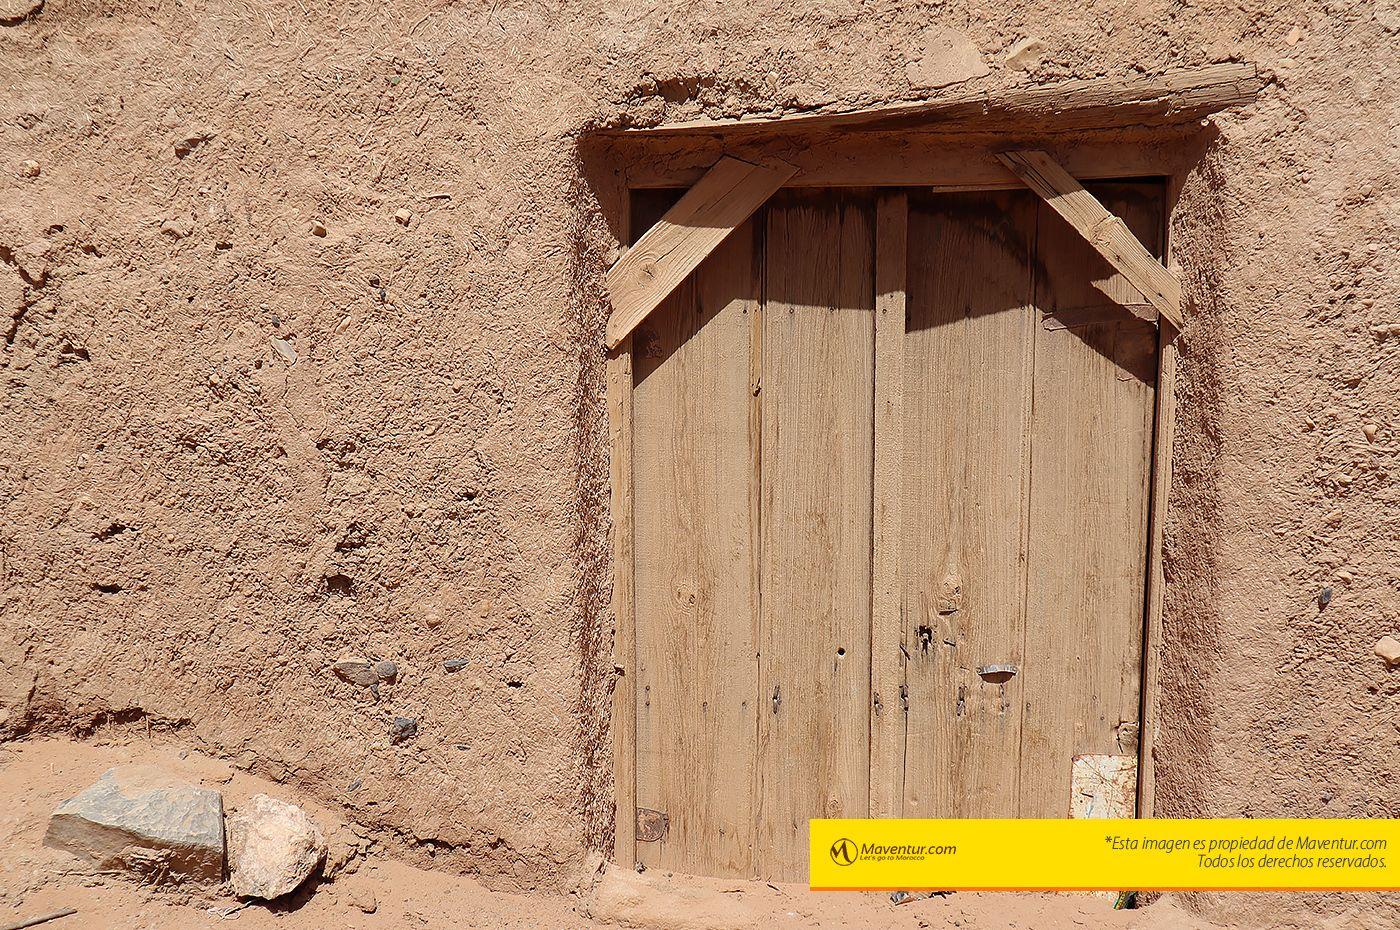 Maventur_fotografia tour marruecos